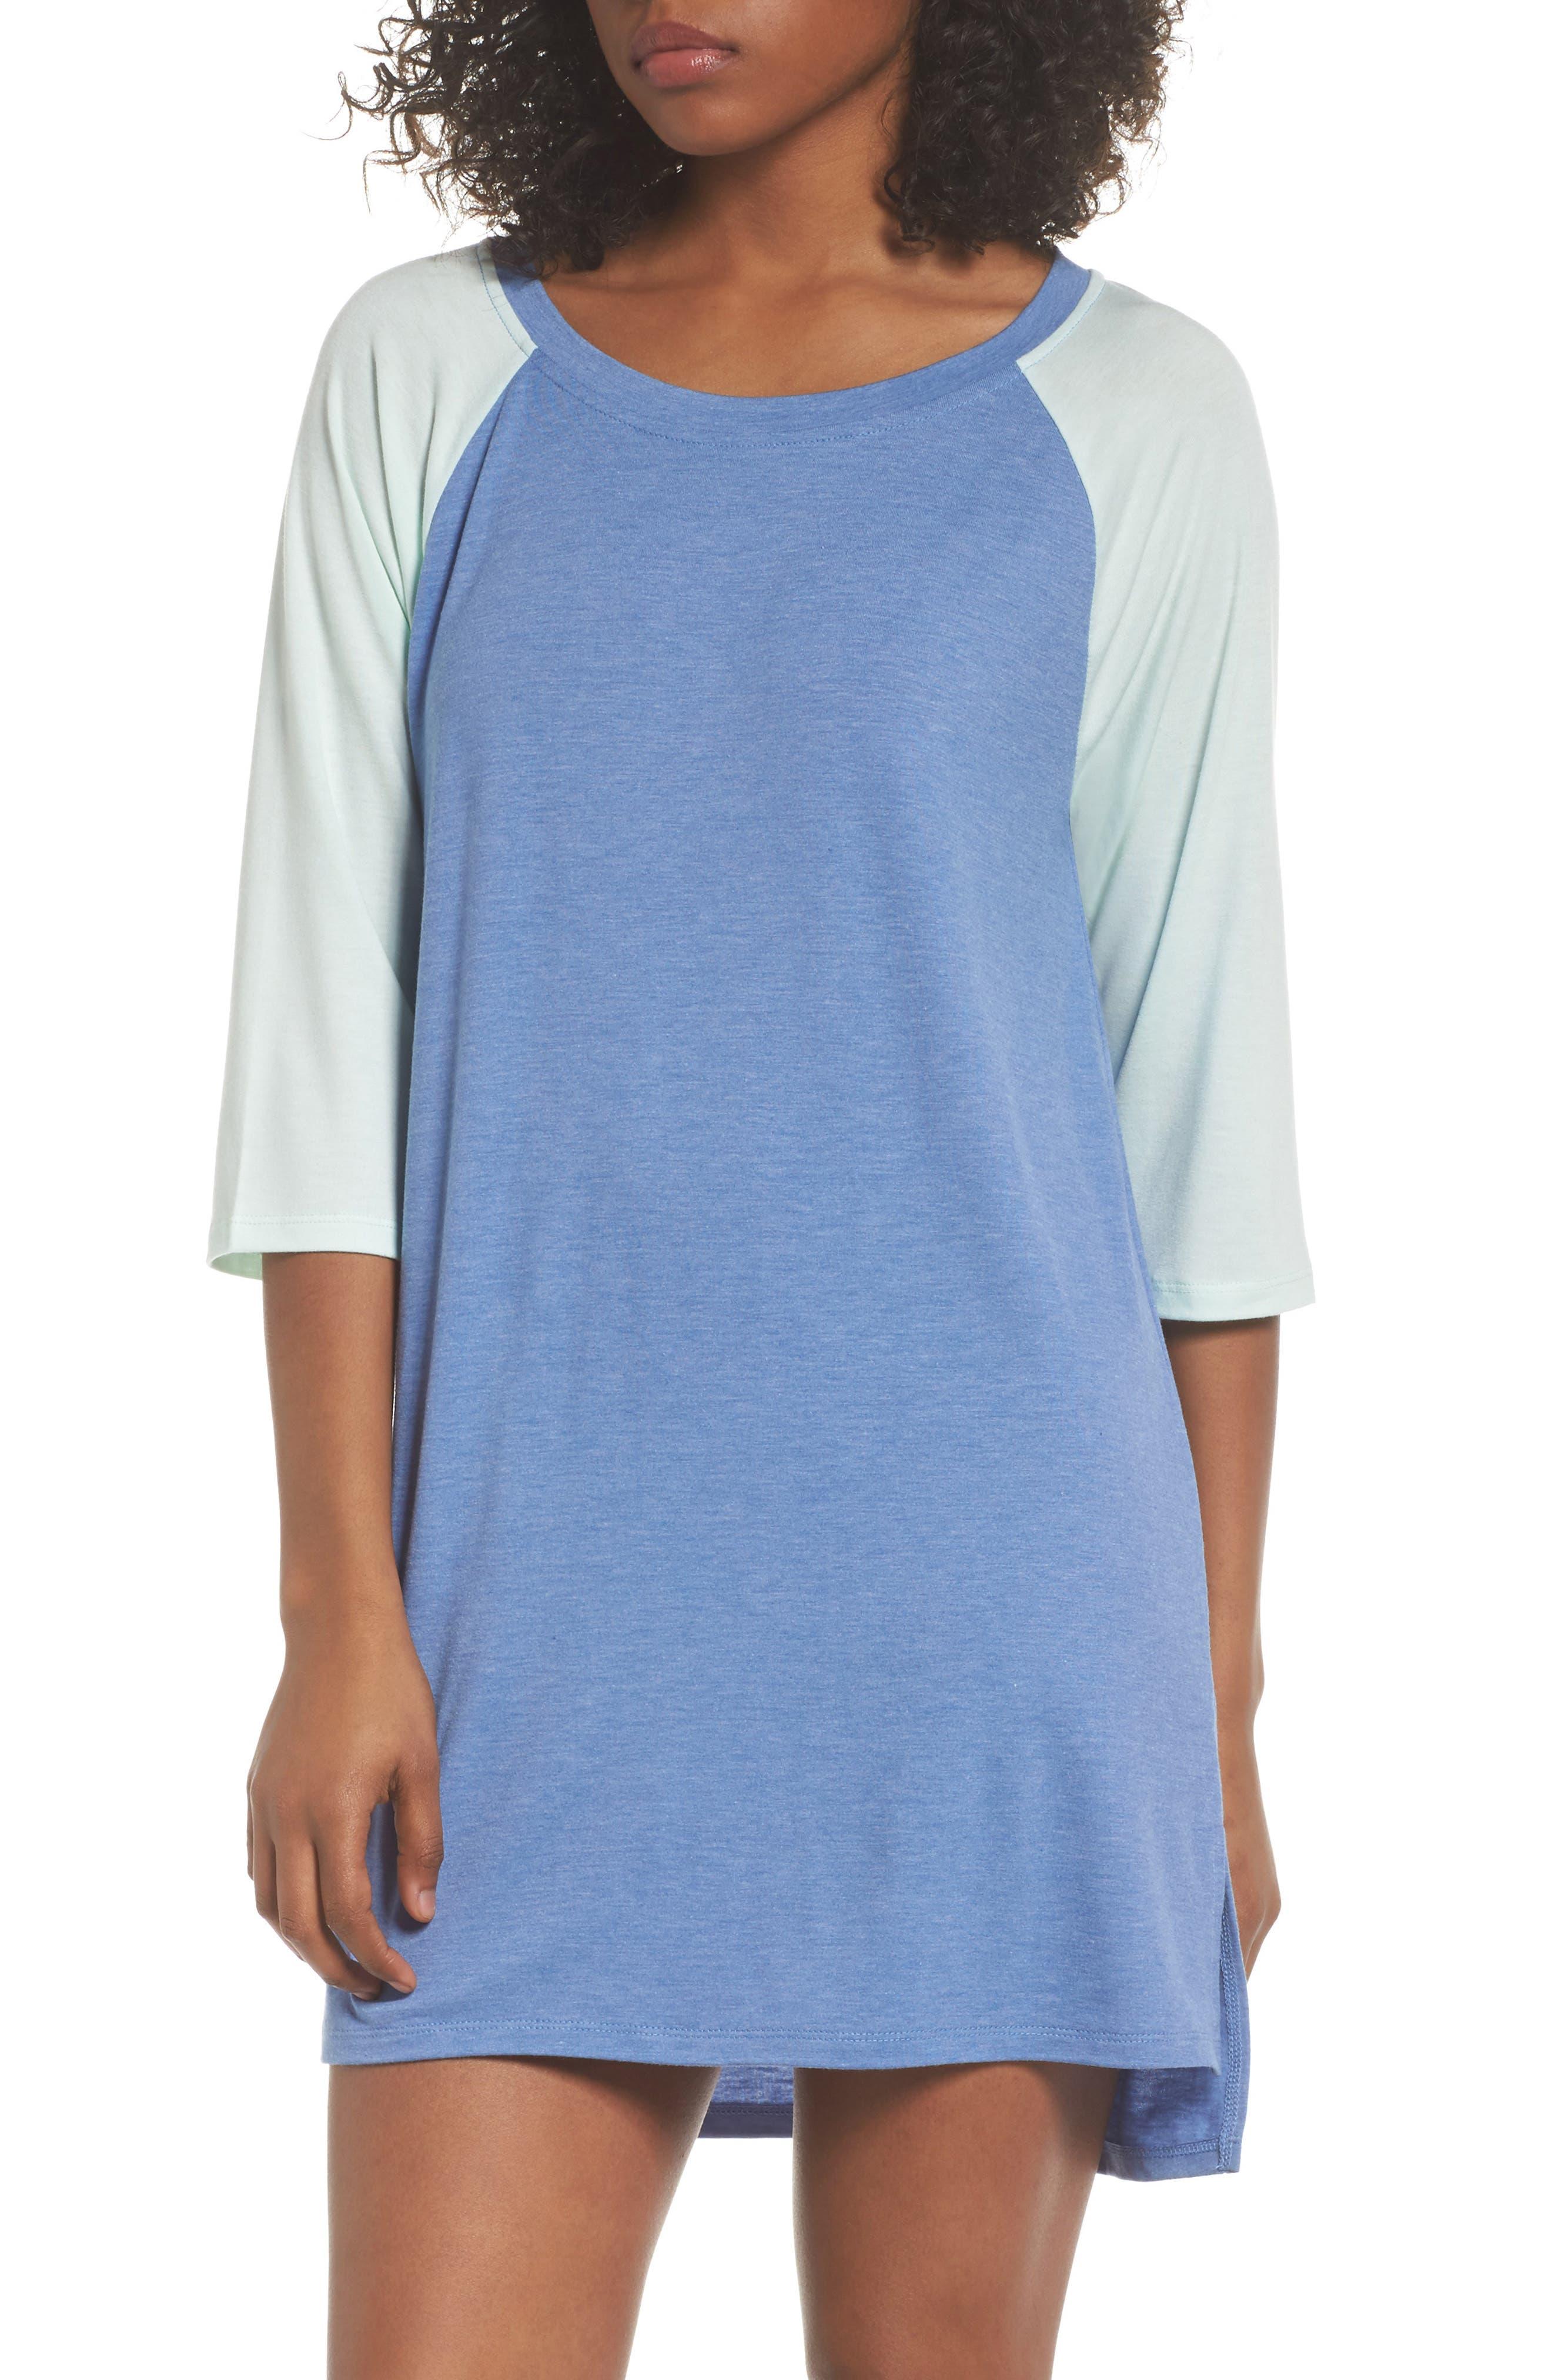 Alternate Image 1 Selected - Honeydew All American Sleep Shirt (2 for $60)